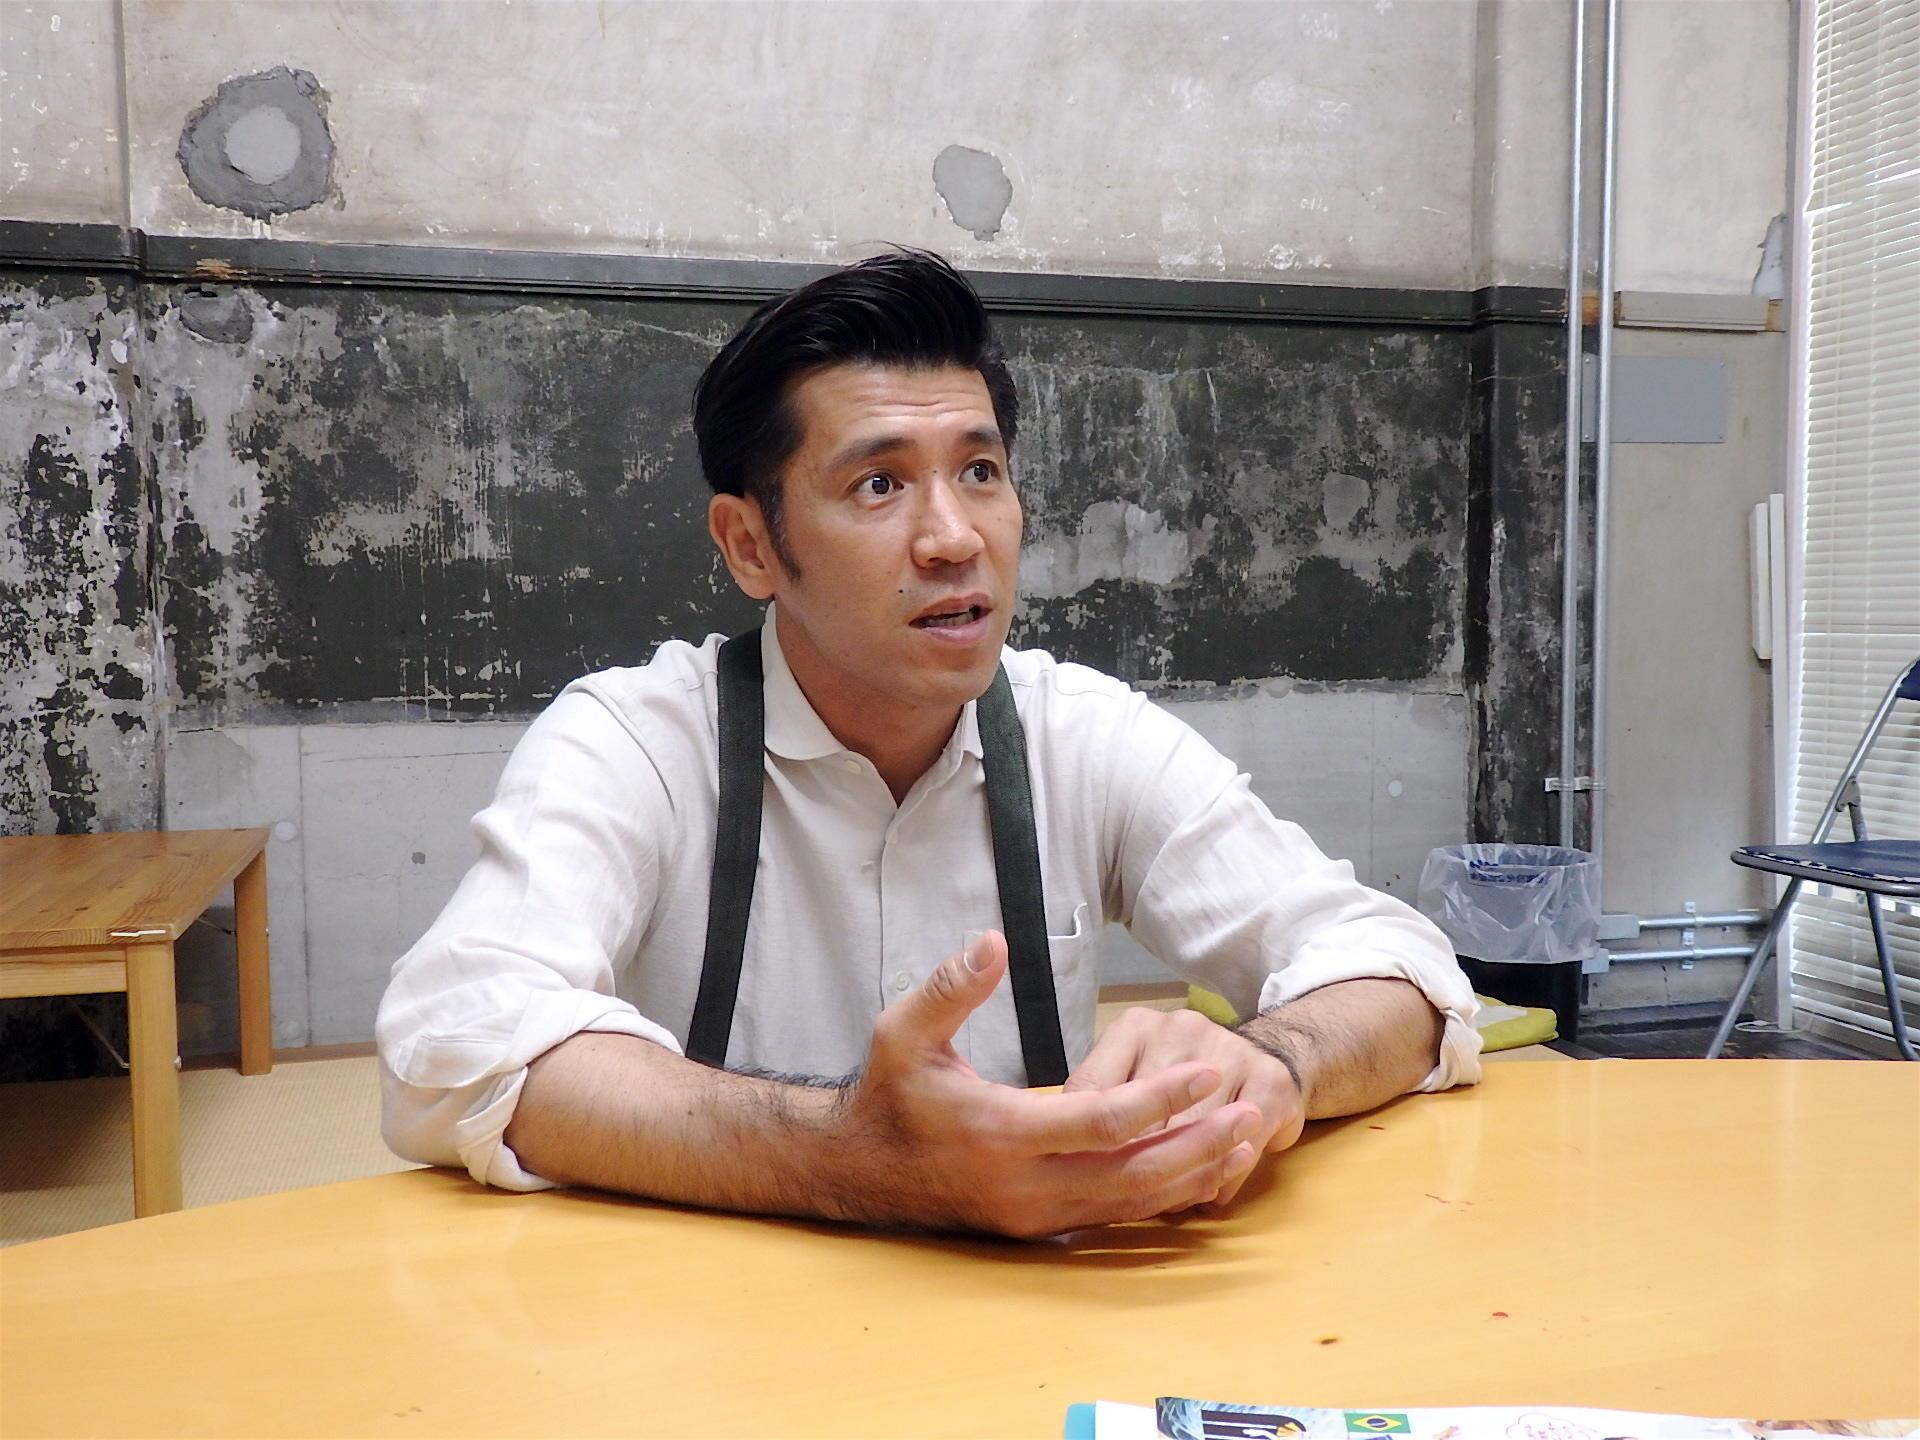 http://news.yoshimoto.co.jp/20160531142719-4ff8dec8def17aa96dc1a185426c6f9e0c133cee.jpg